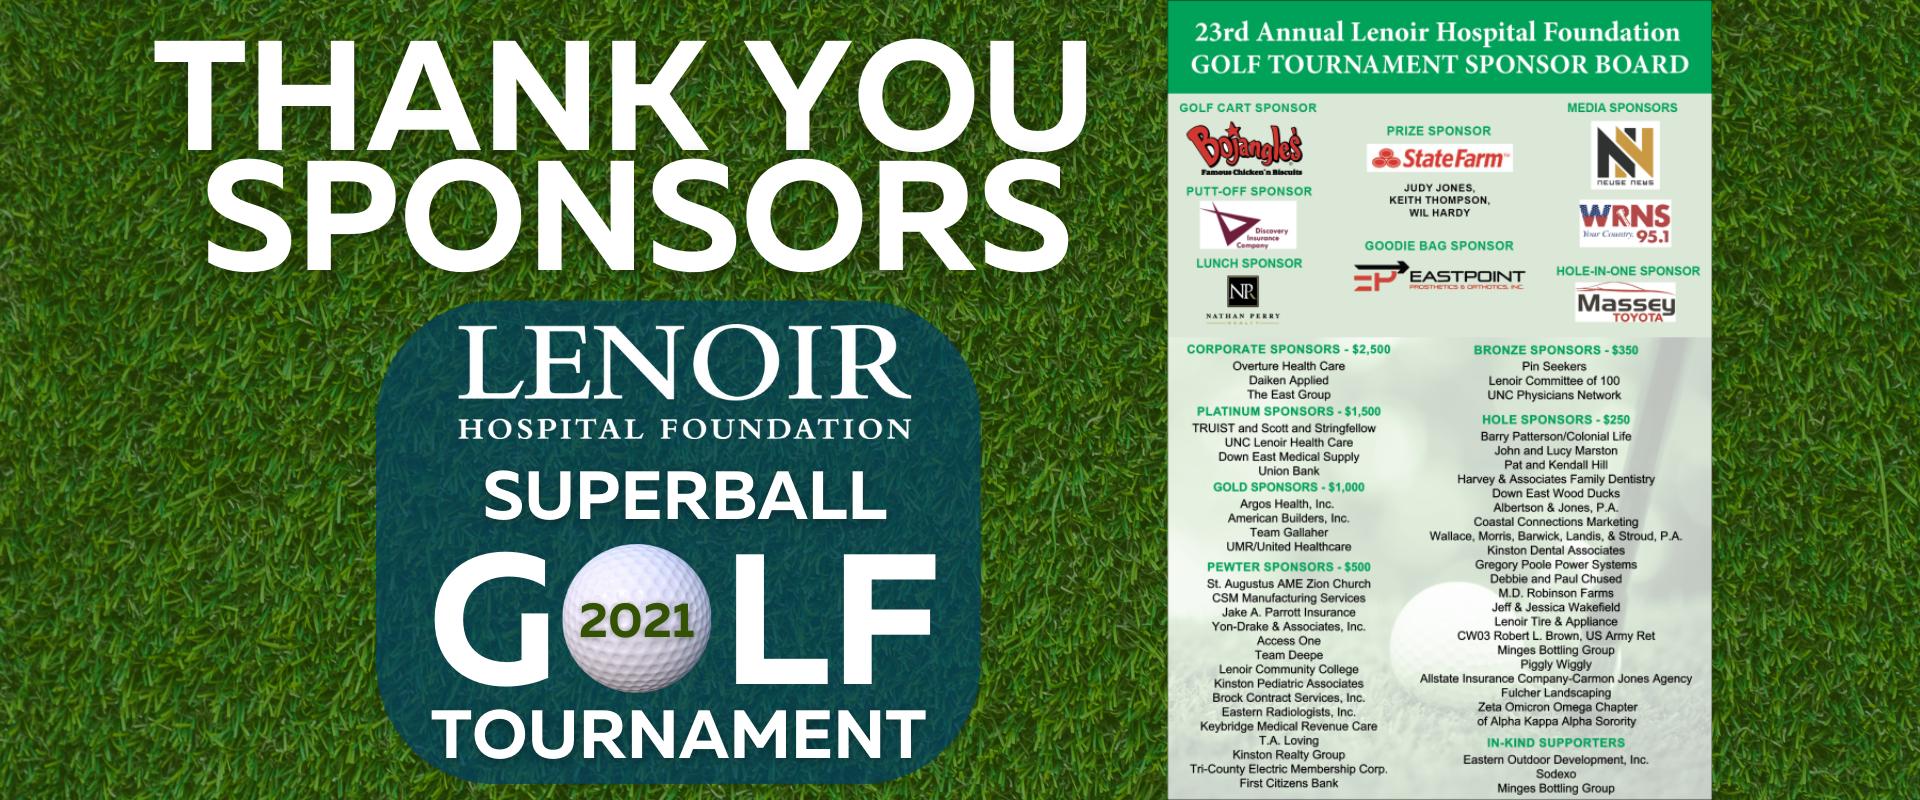 Golf Tournament Sponsor Banner